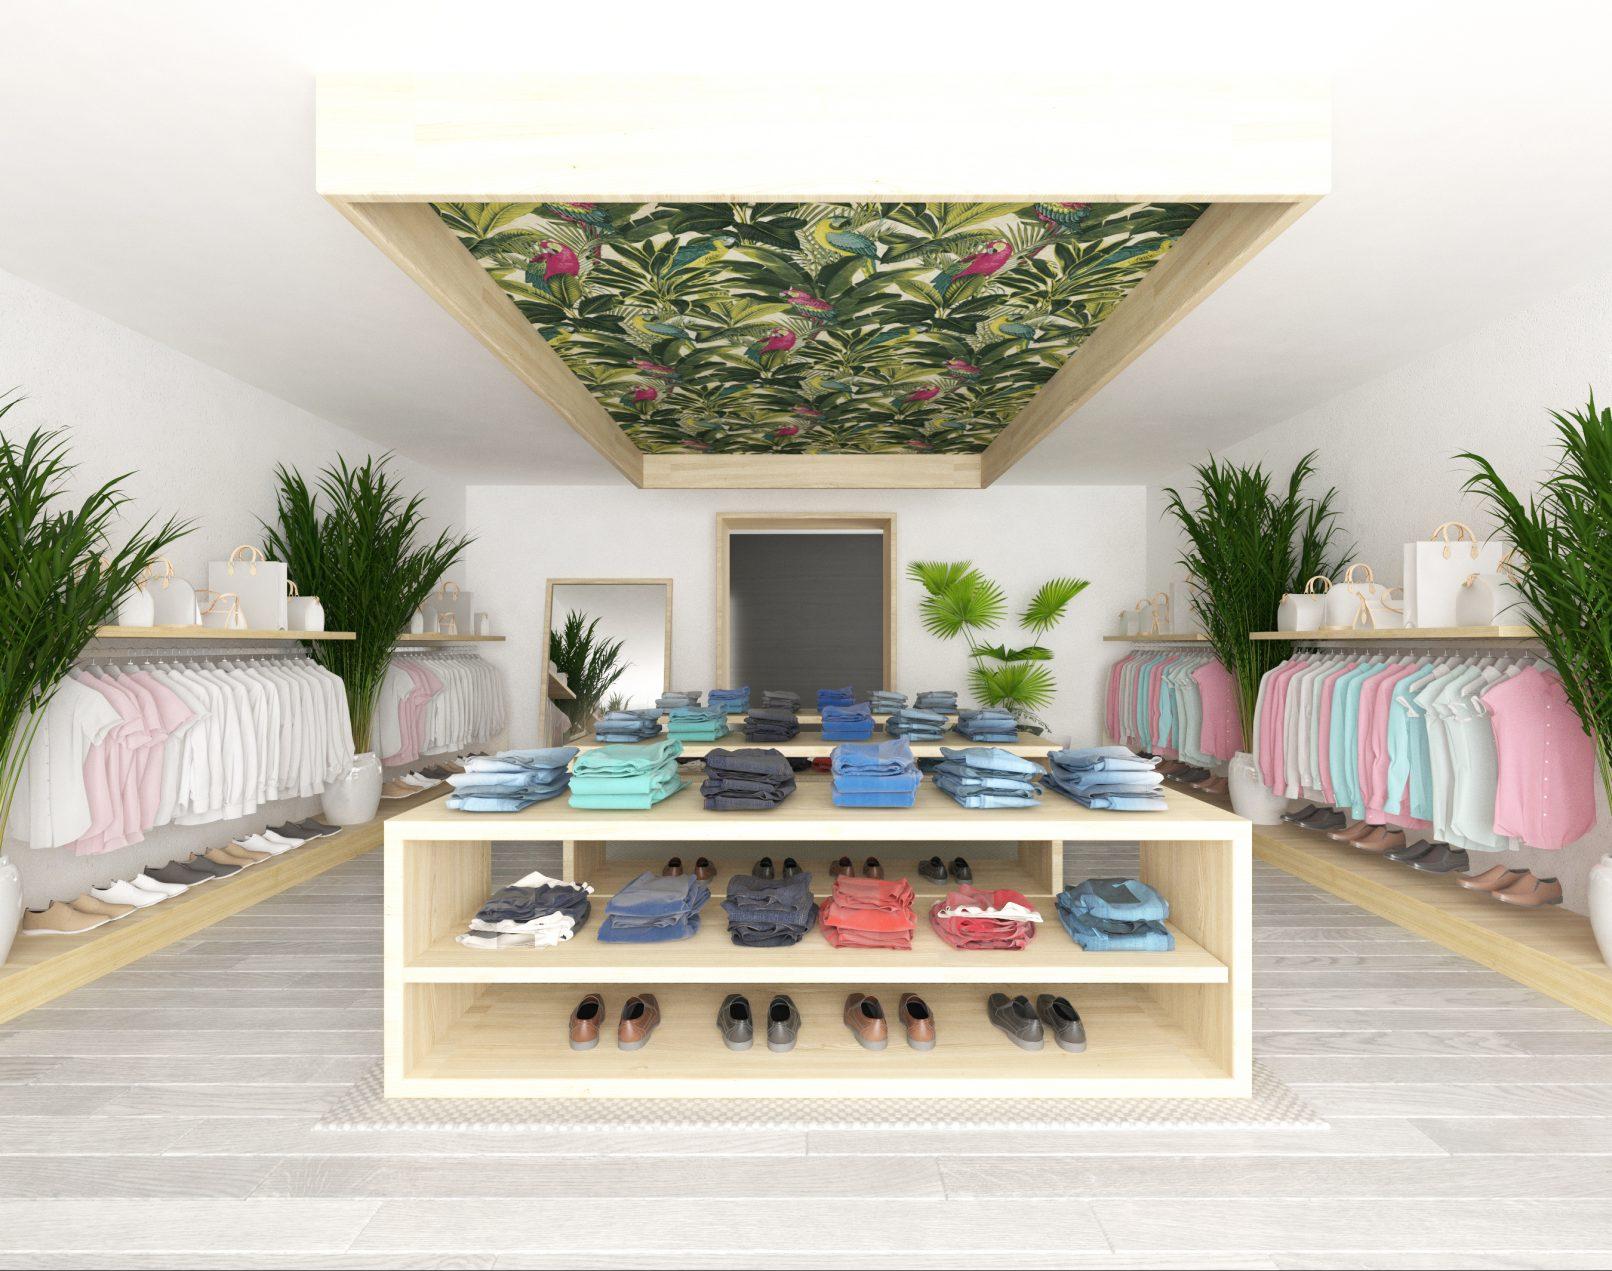 la perla lotoarchilab. Black Bedroom Furniture Sets. Home Design Ideas